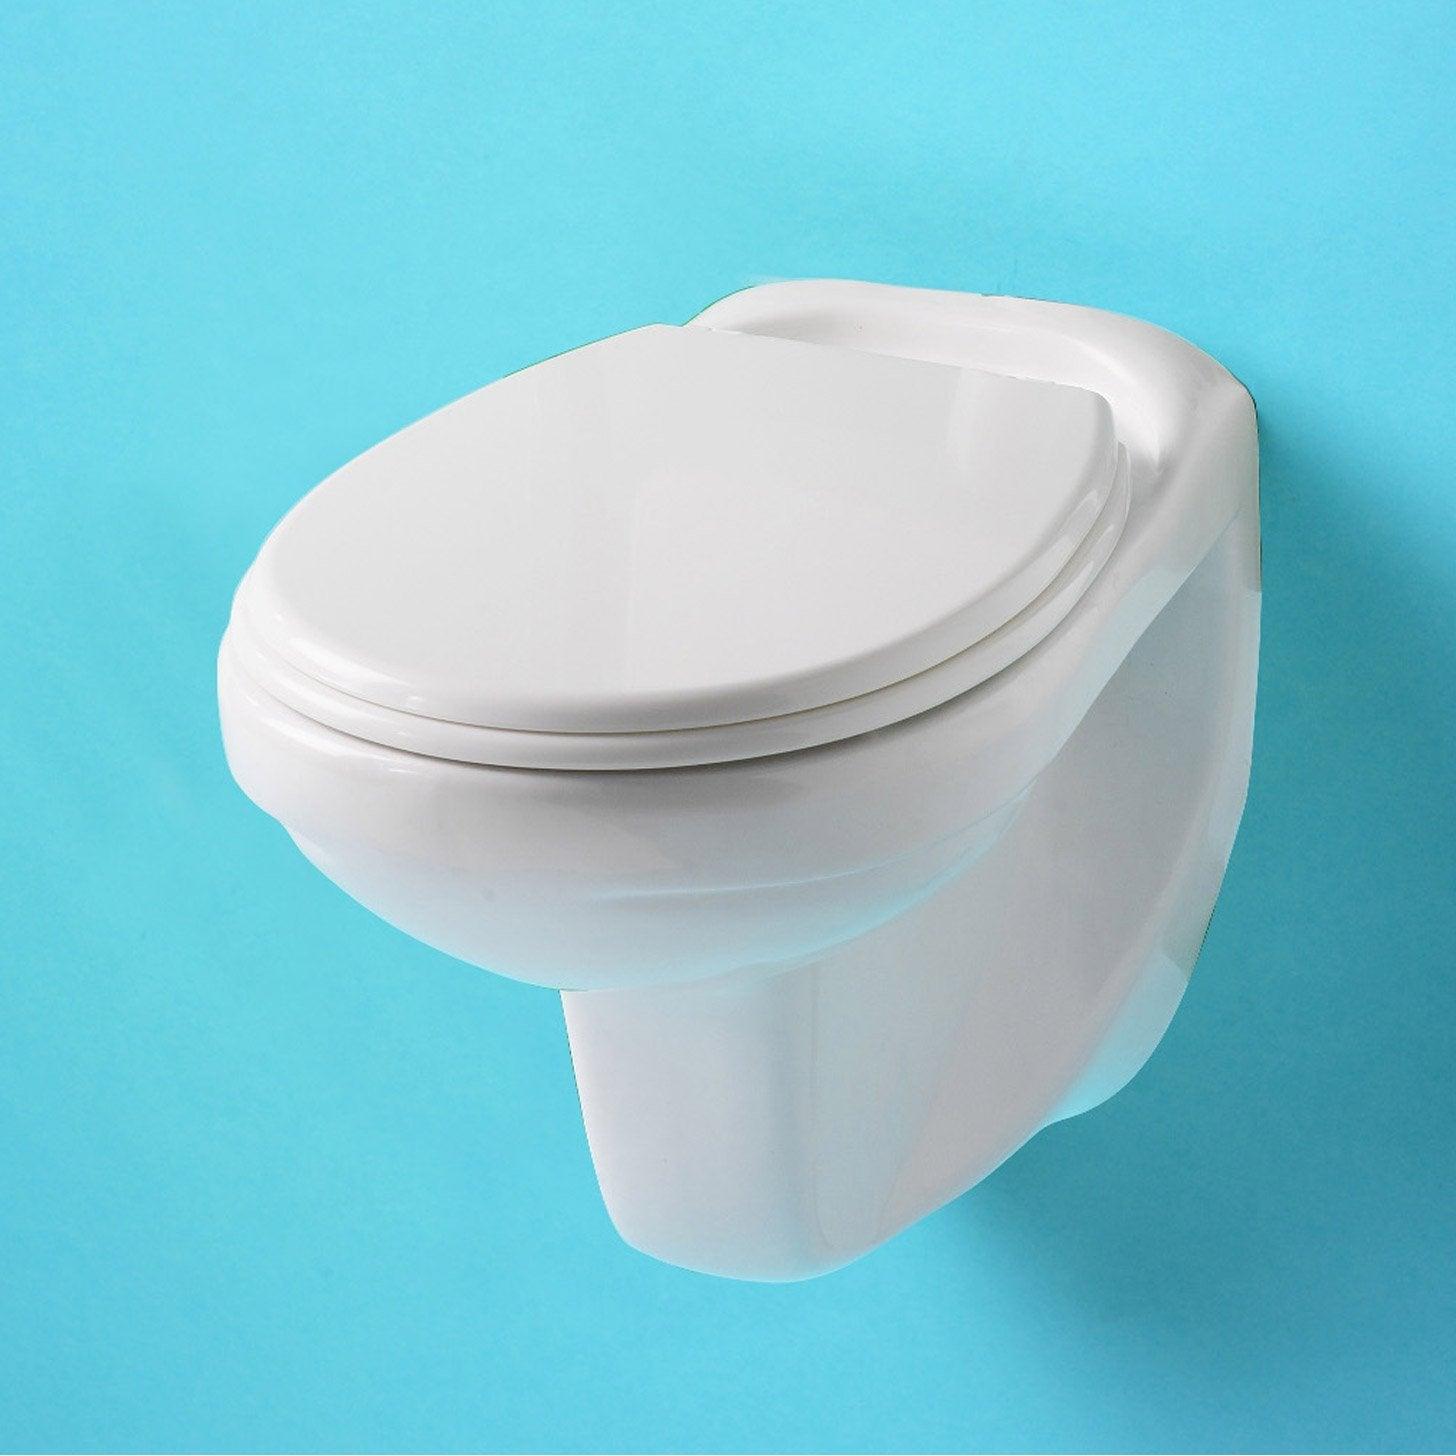 Cuvette pour wc suspendu nerea leroy merlin for Douchette pour wc leroy merlin